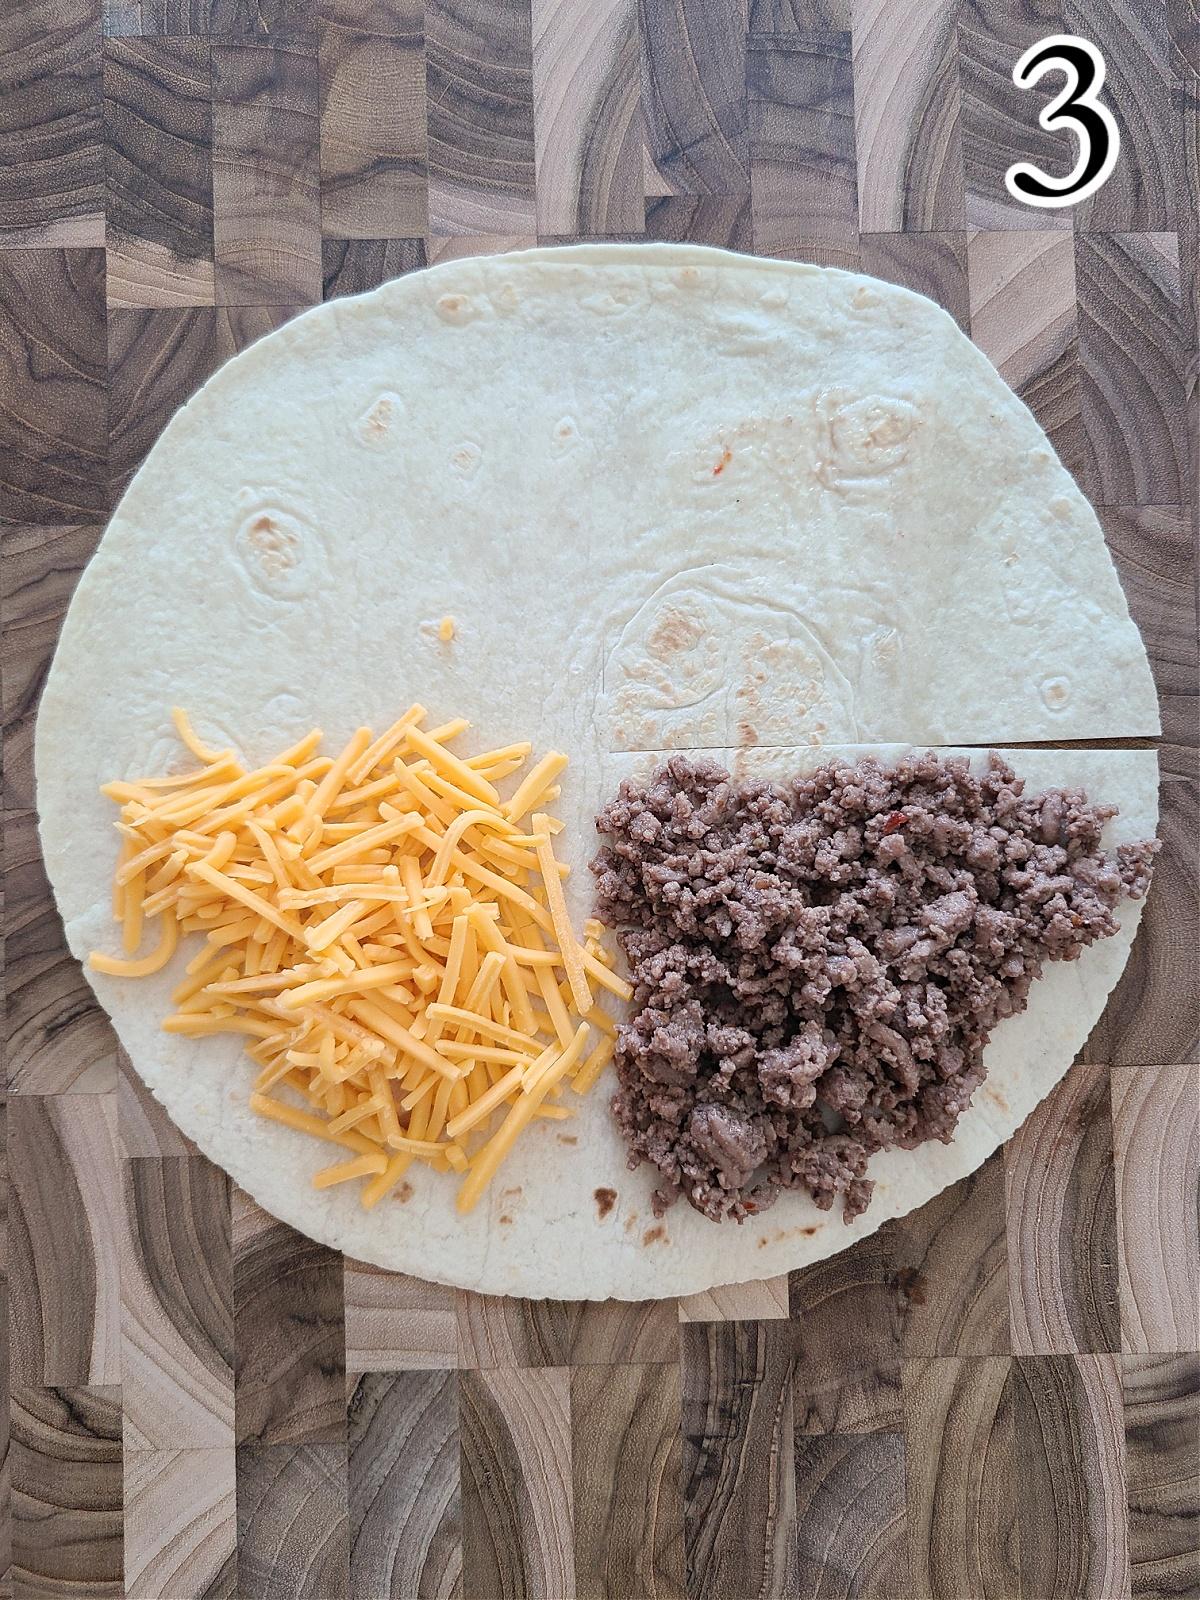 Making BBQ Cheeseburger Stacked Tortilla Wraps